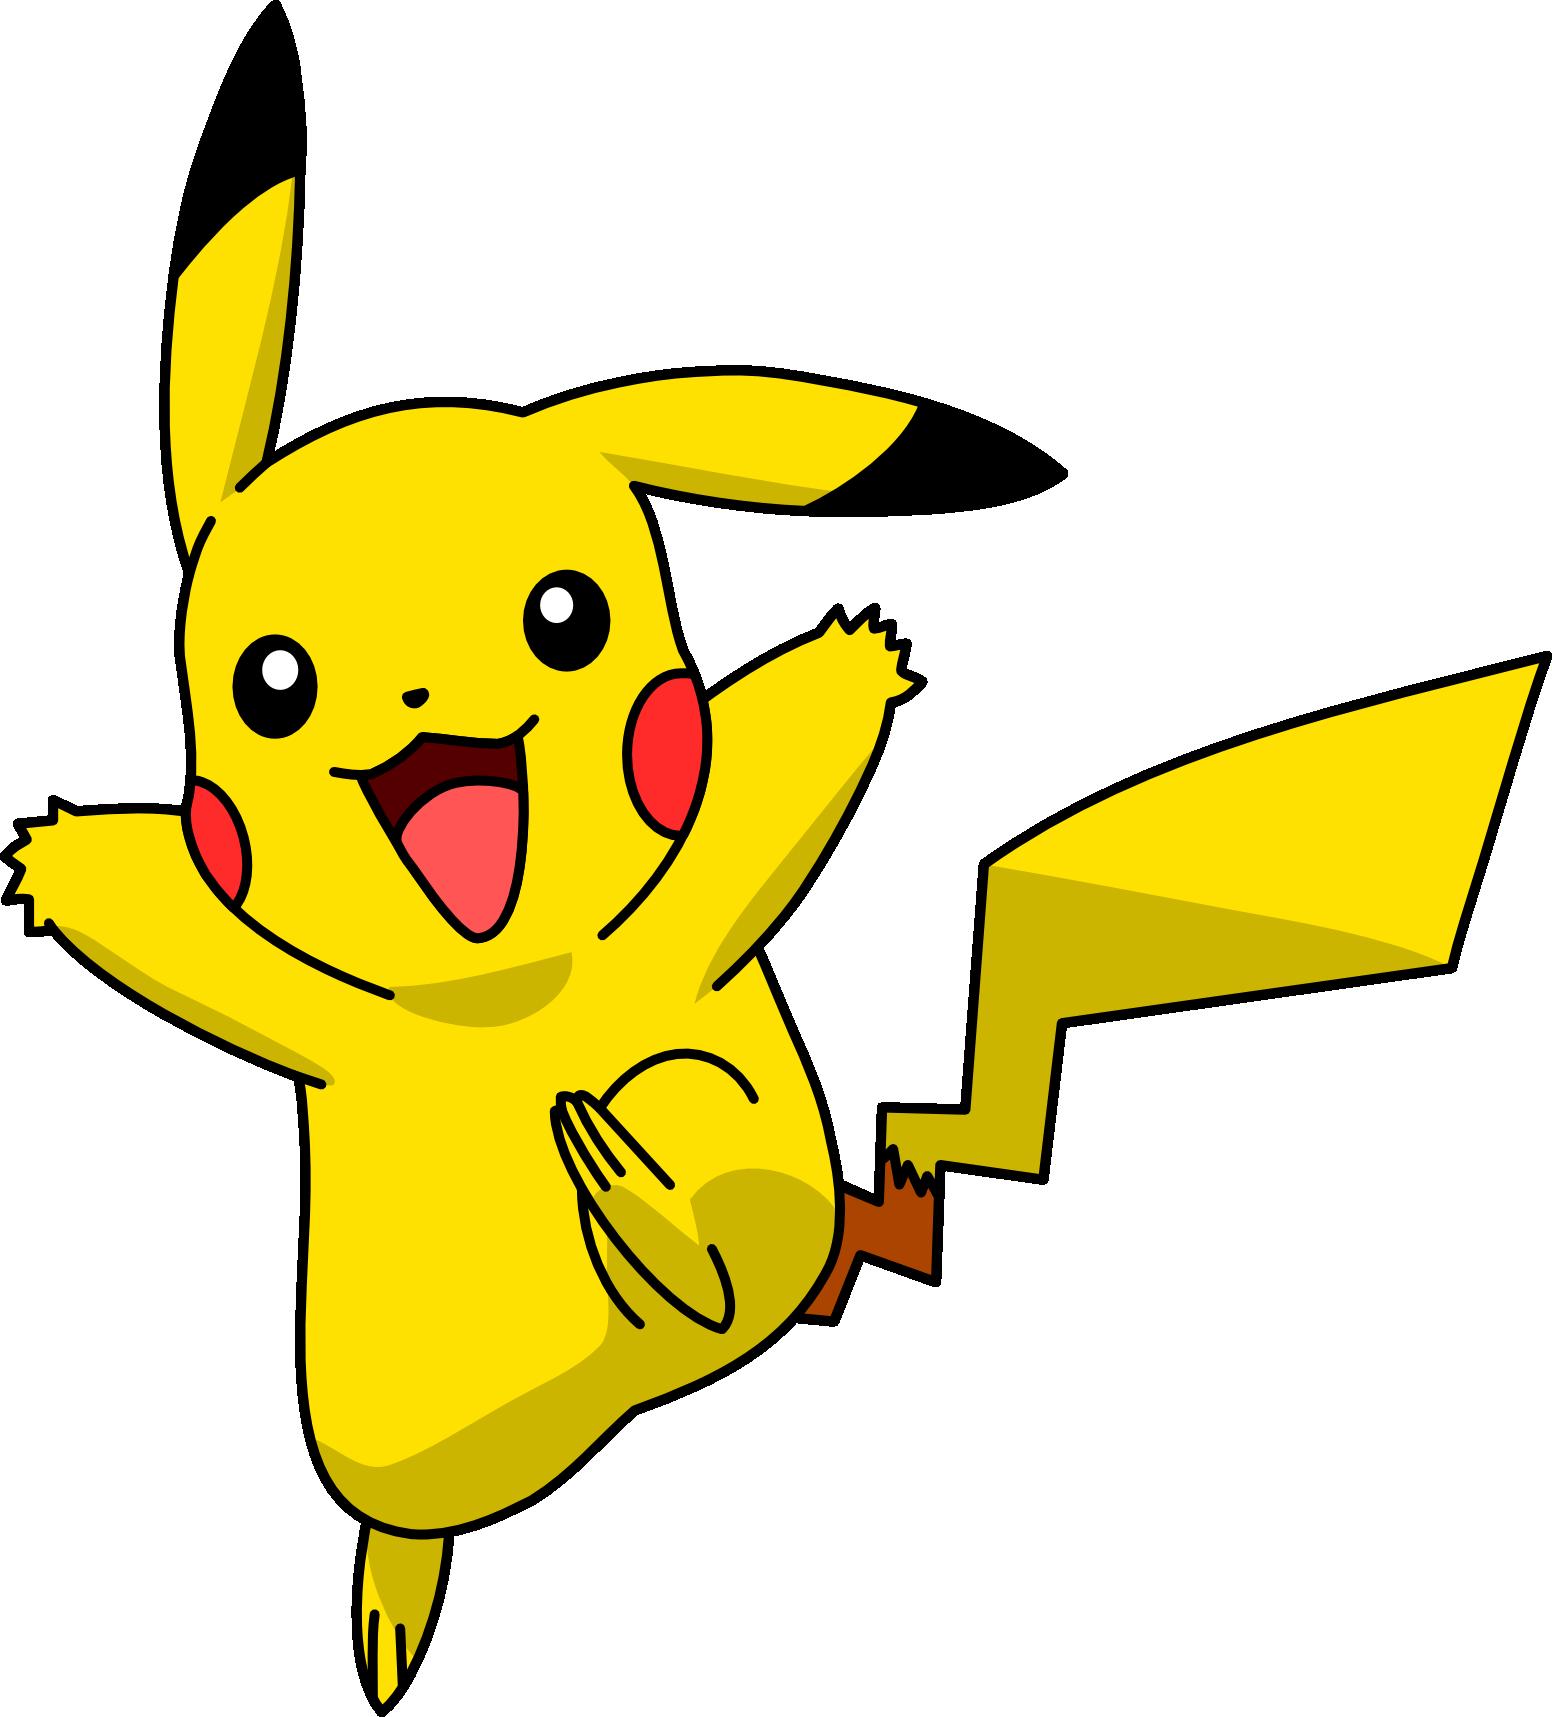 Pikachu 03 444321451